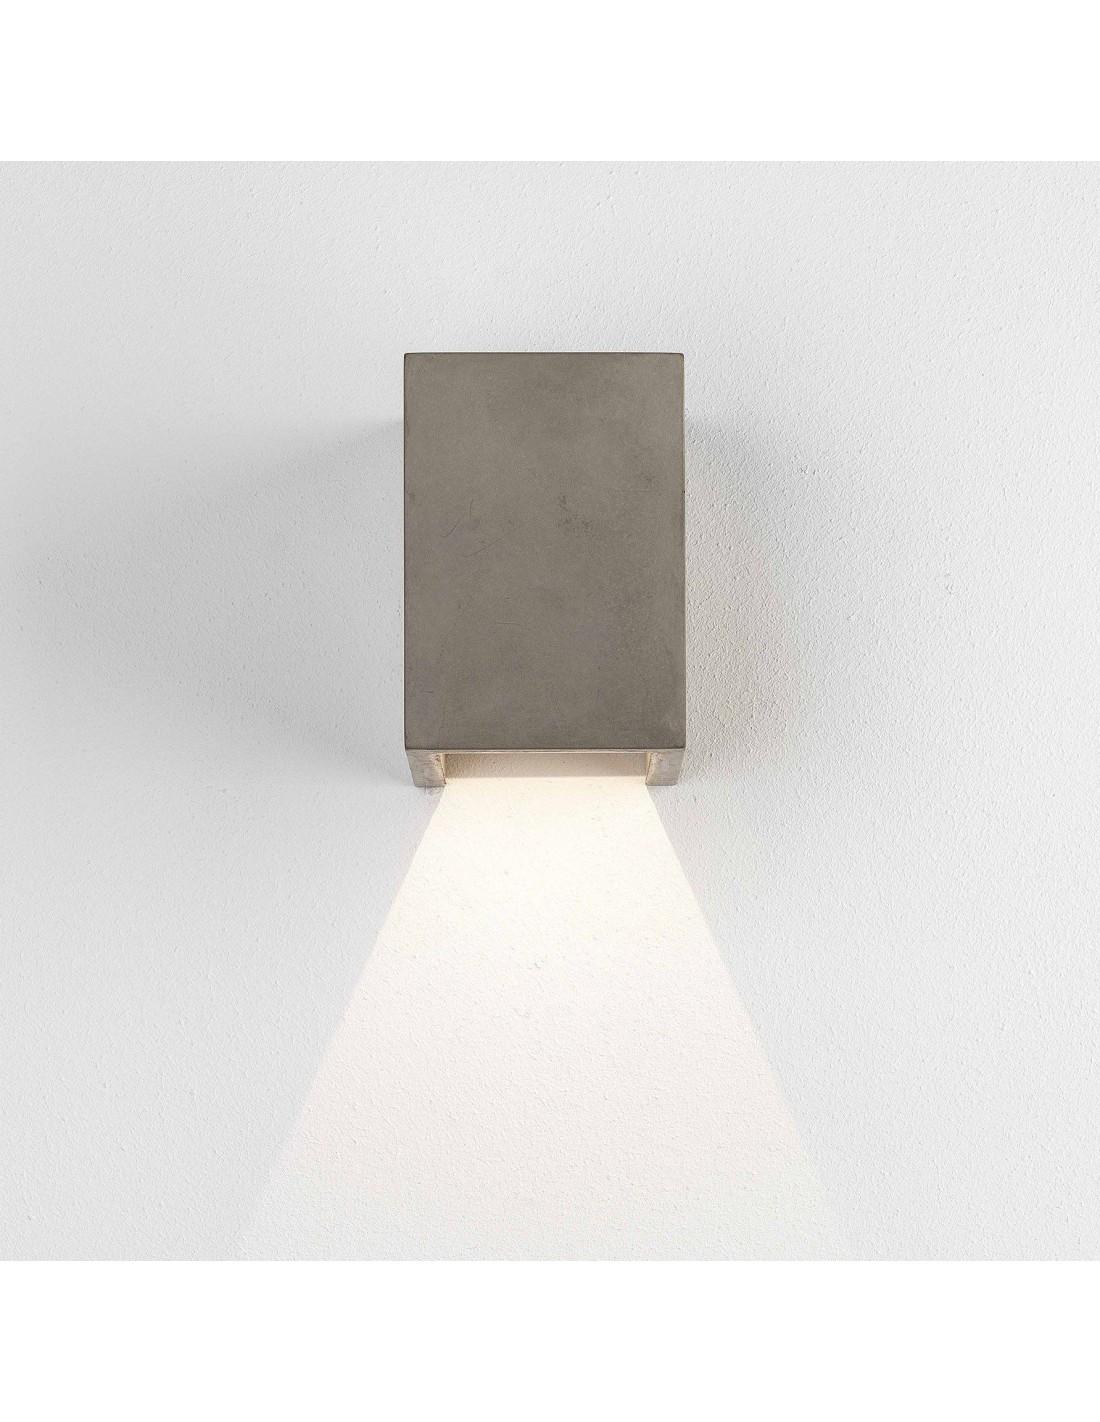 Applique Oslo 120 LED concrete Astro lighting - Valente Design